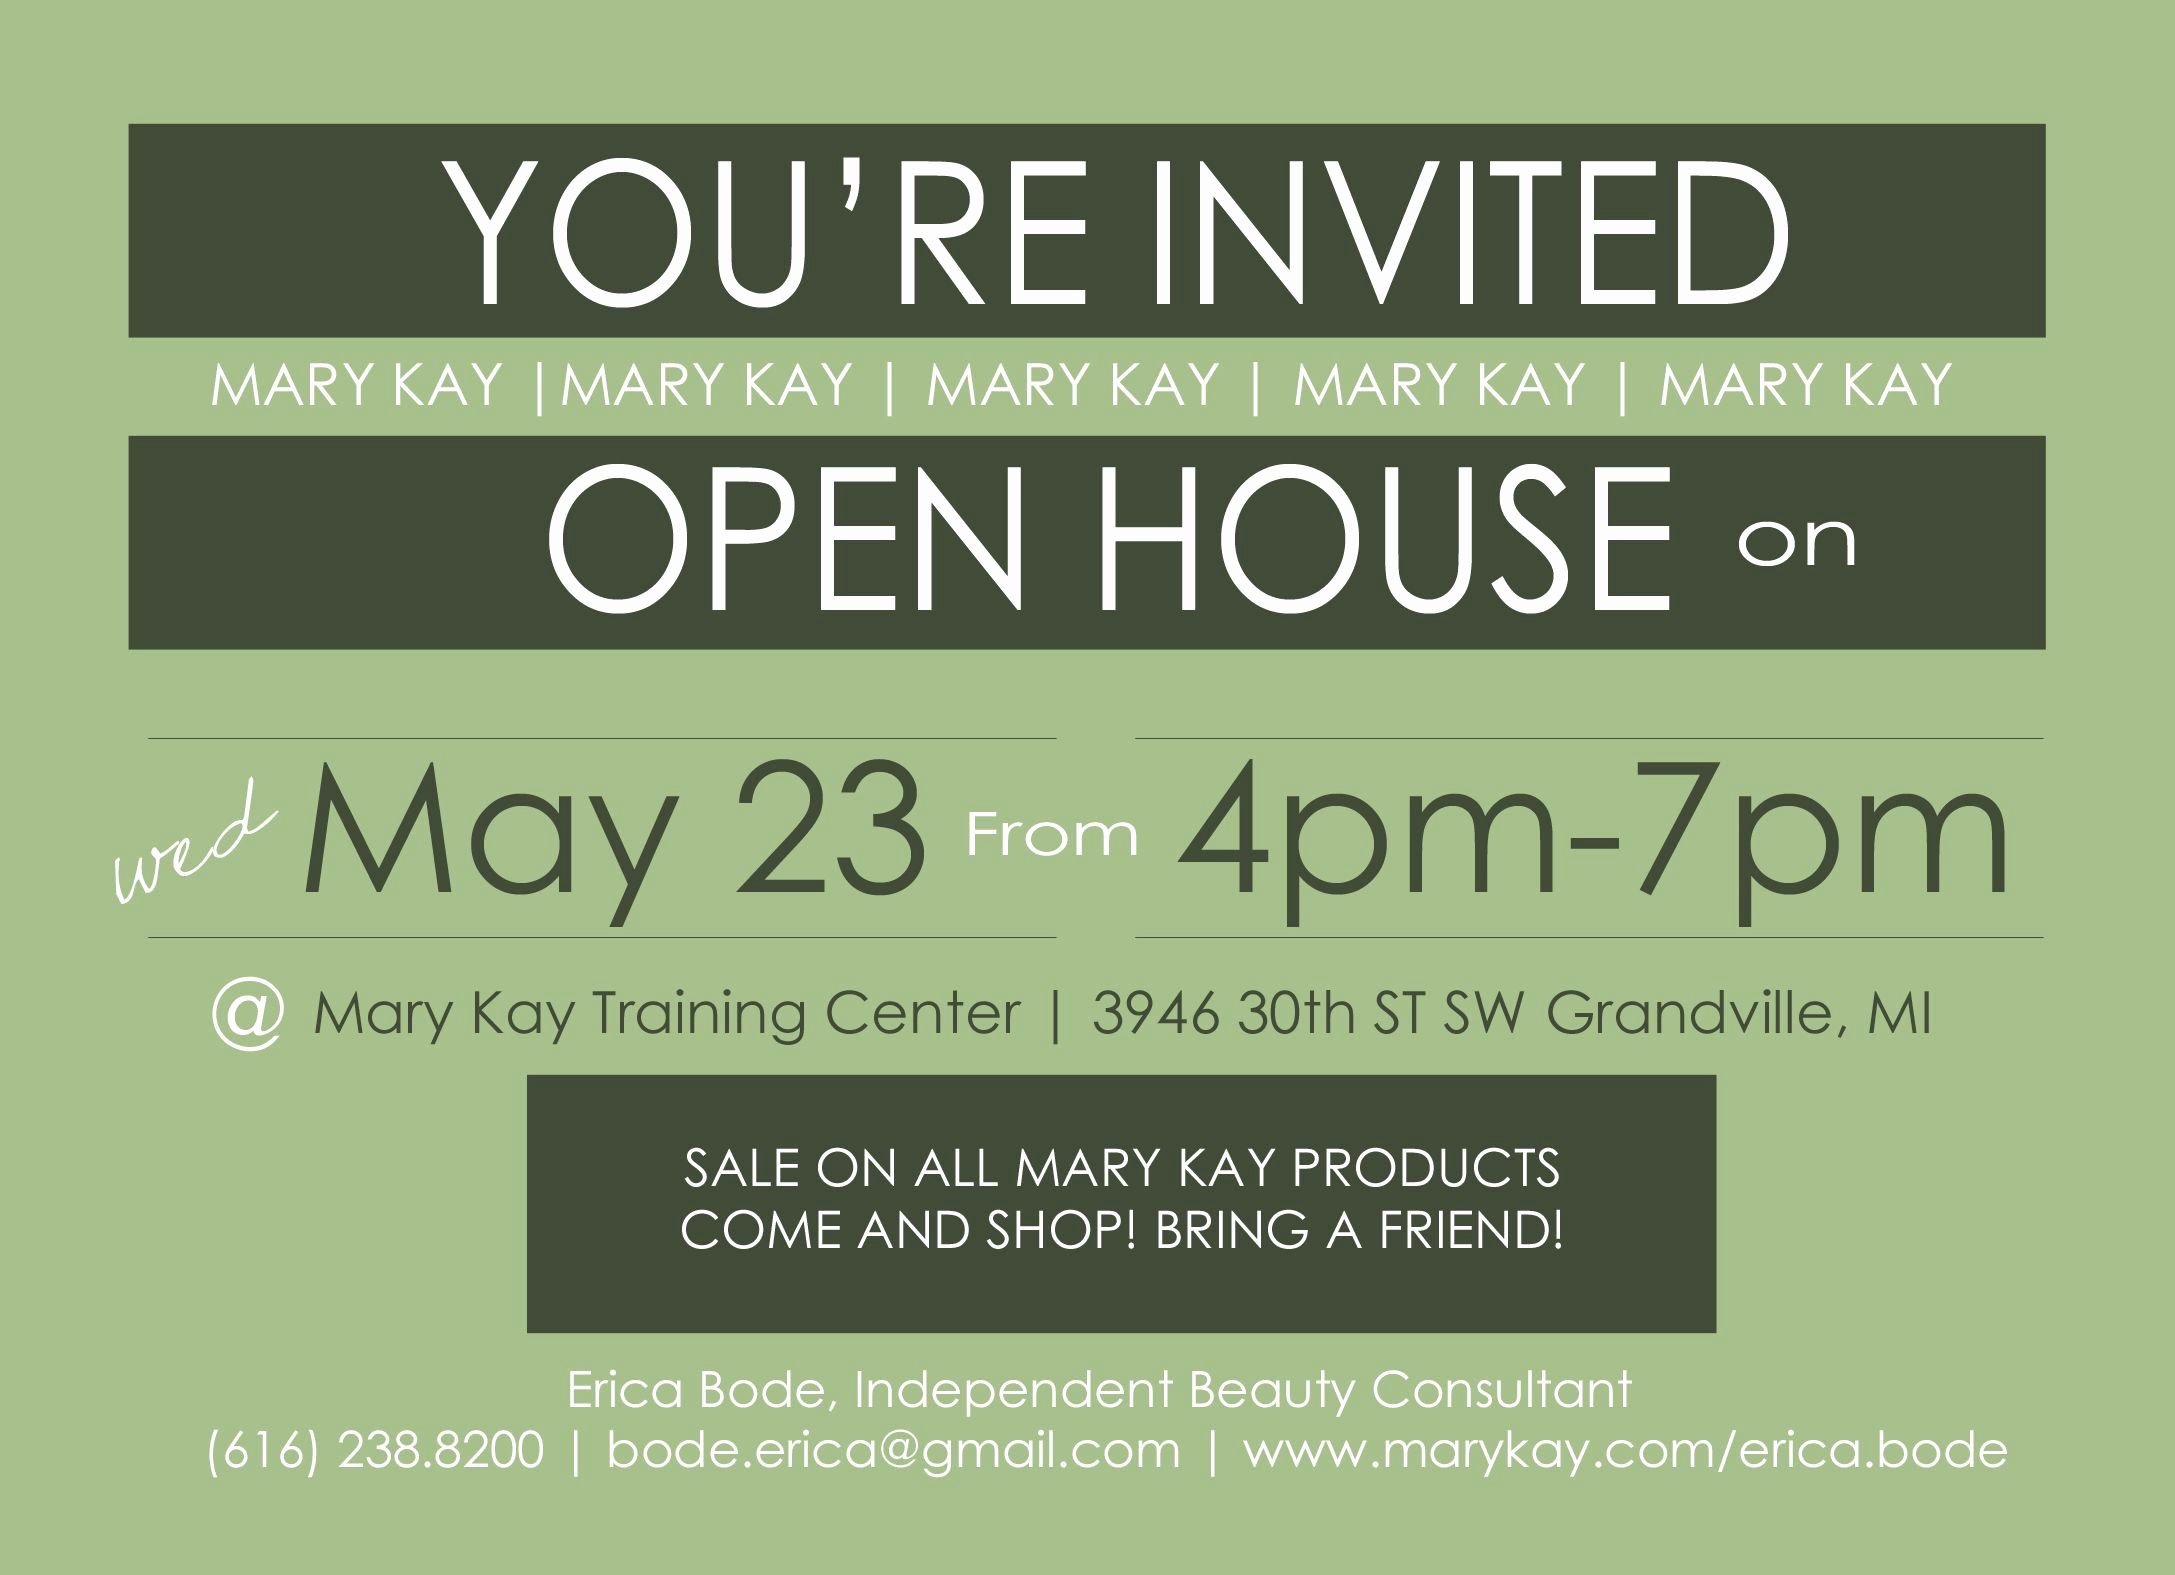 Mary Kay Open House Invitation Lovely Open House Invitation Mary Kay Erica Bode